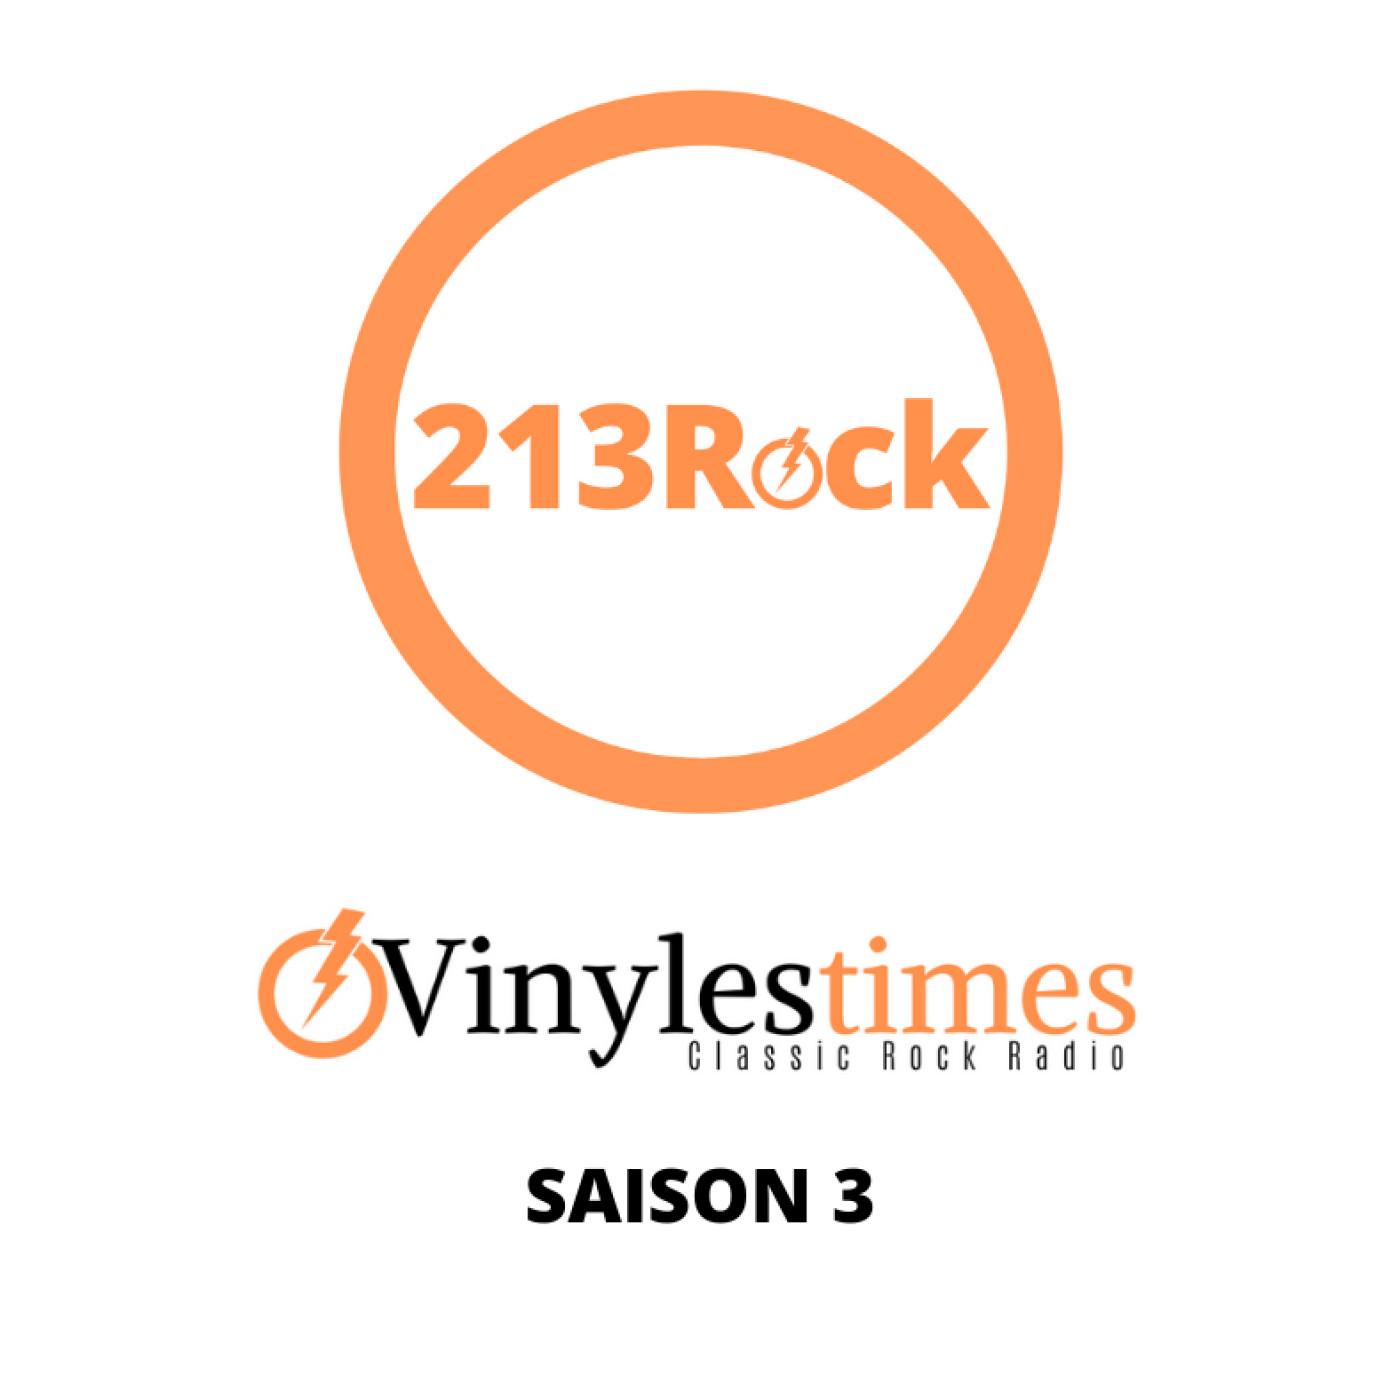 213Rock Podcast Harrag Melodica  Free app Vinylestimes 06 01 2020